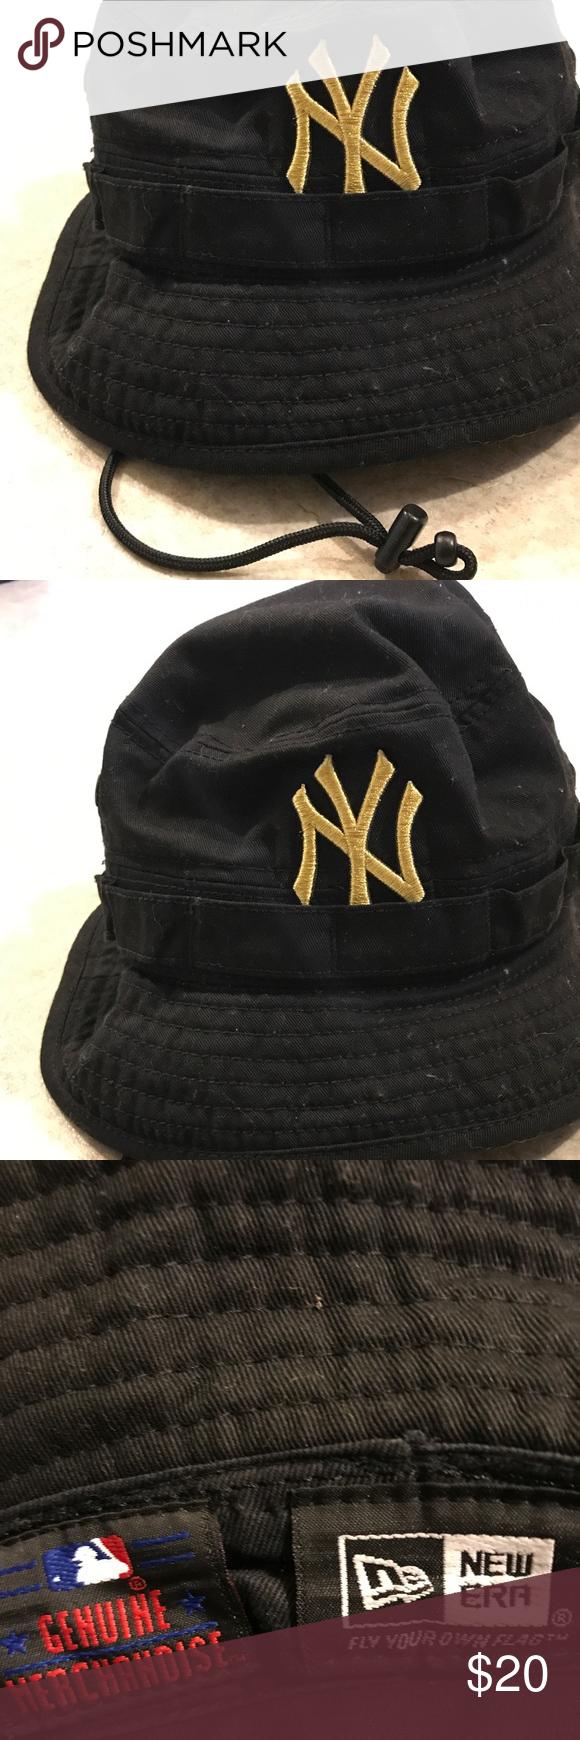 Black Gold New Era Ny Yankees Mlb Bucket Hat Xl Genuine New Era Men S Bucket Hat Size Xl With Yankees Fashion Tips Fashion Design